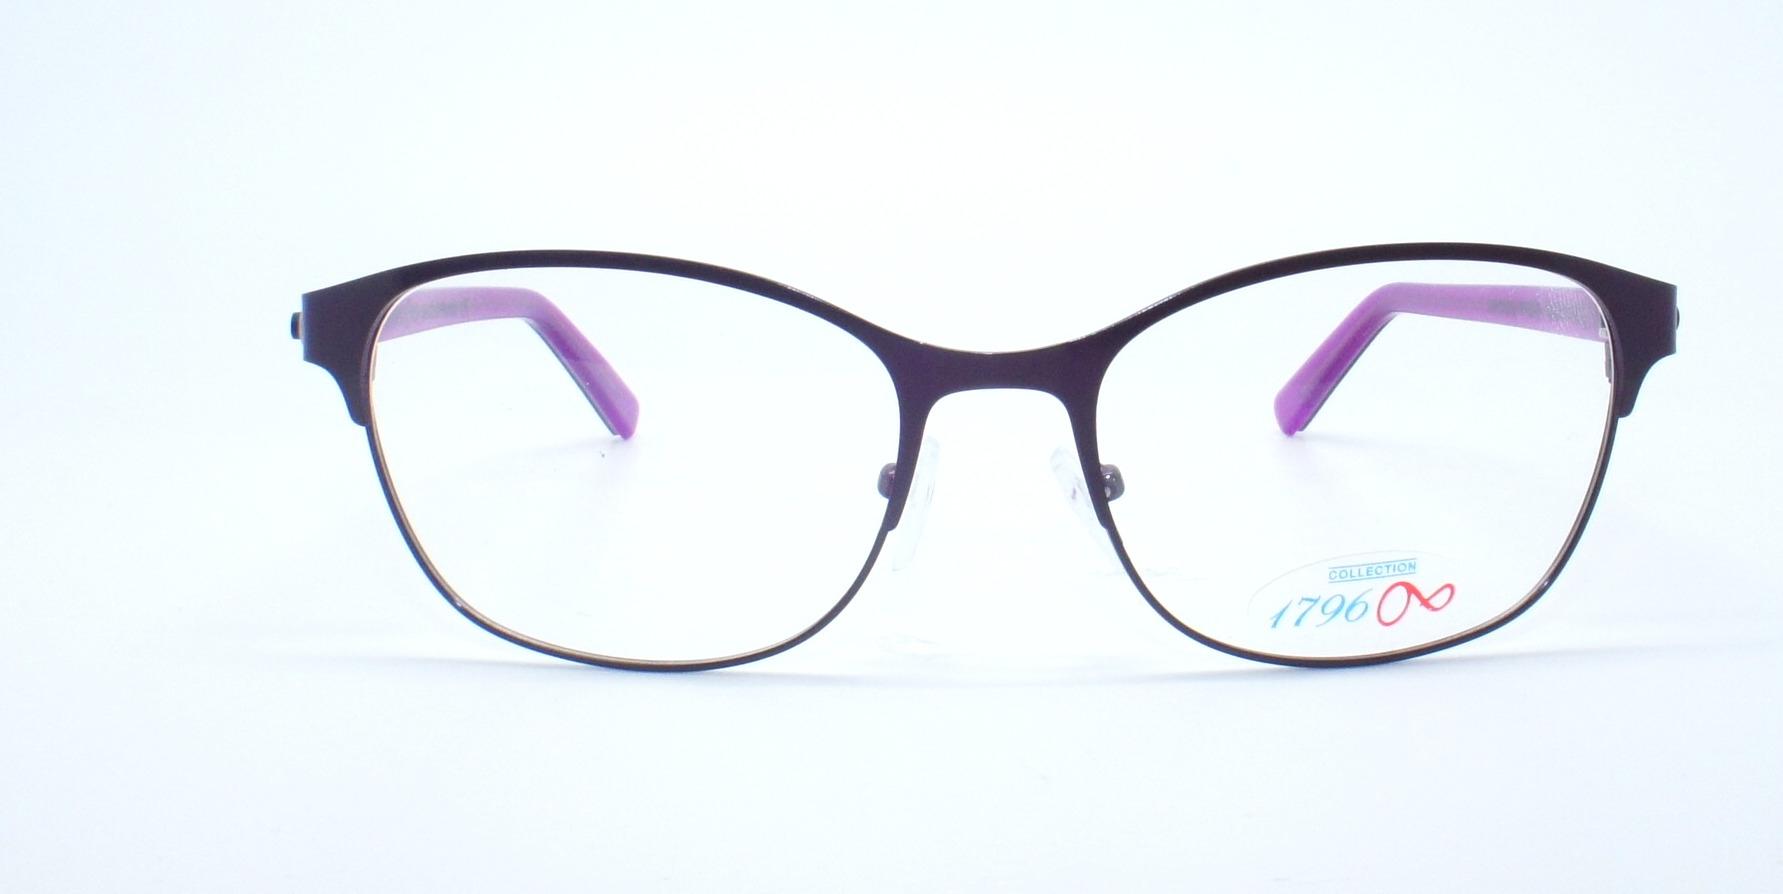 lunettes de vue 1796 cbfc 1809 prune 52 17. Black Bedroom Furniture Sets. Home Design Ideas